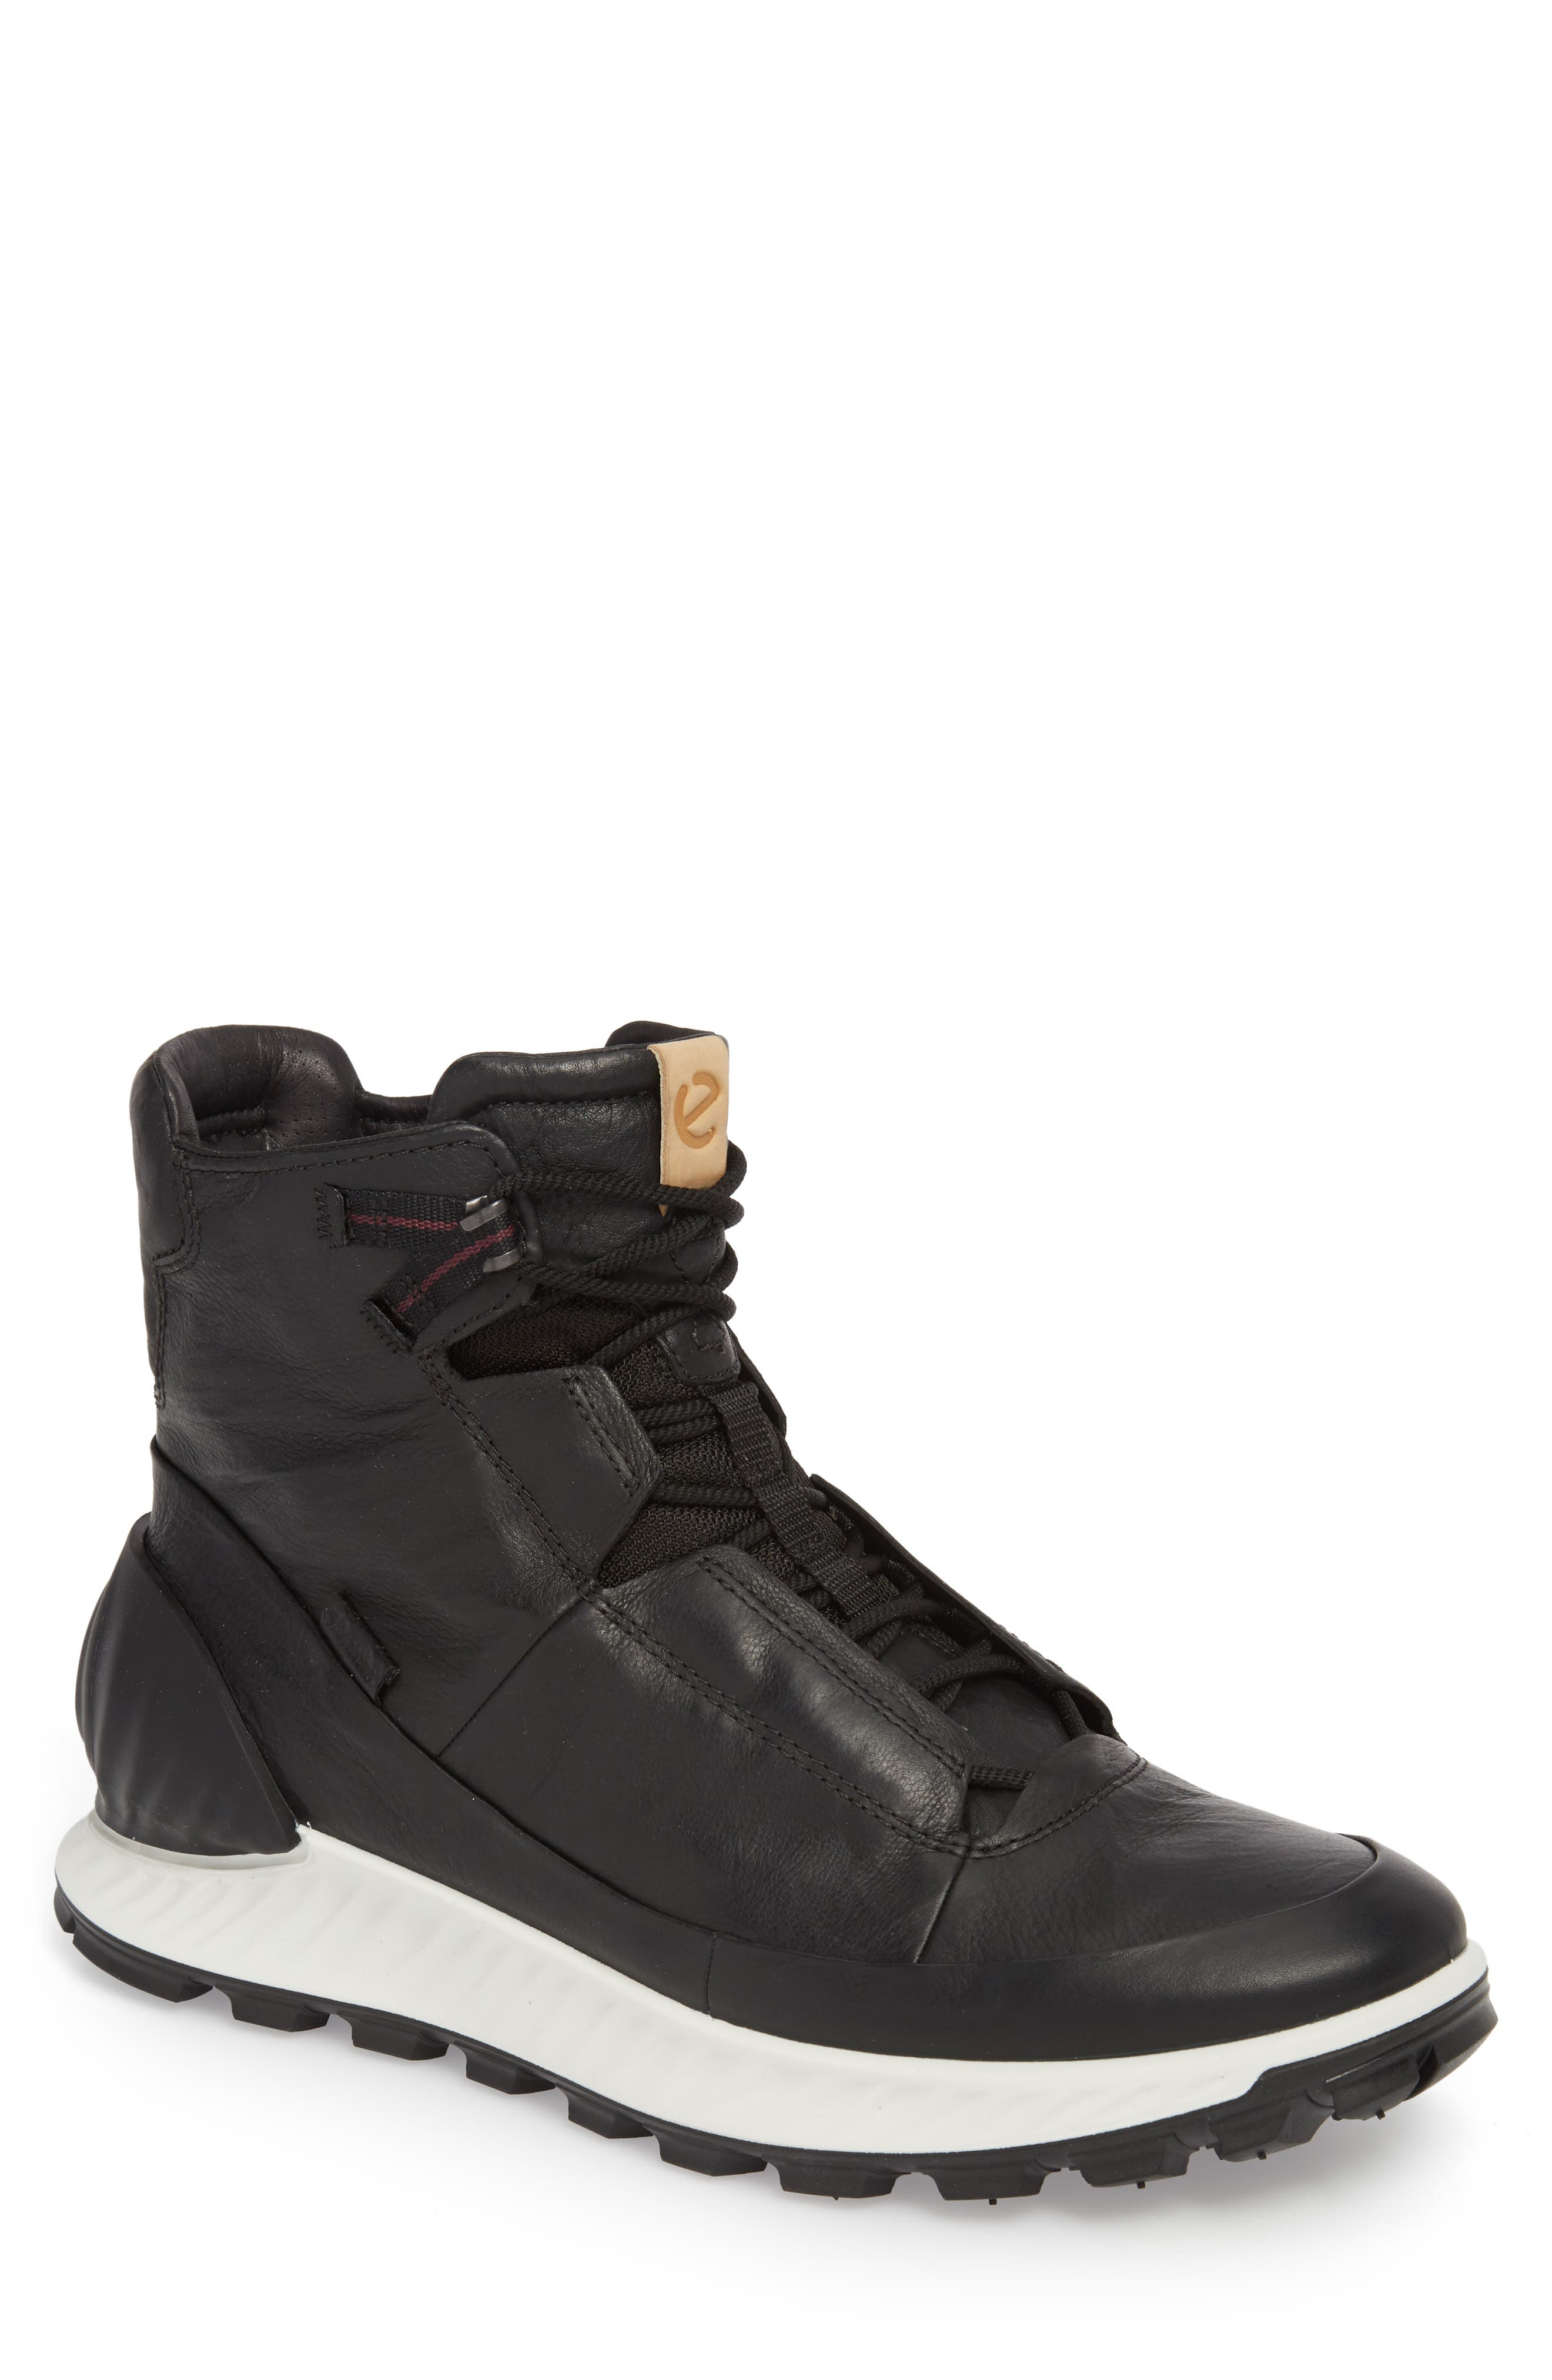 Ecco Limited Edition Exostrike Dyneema Sneaker Boot, Black